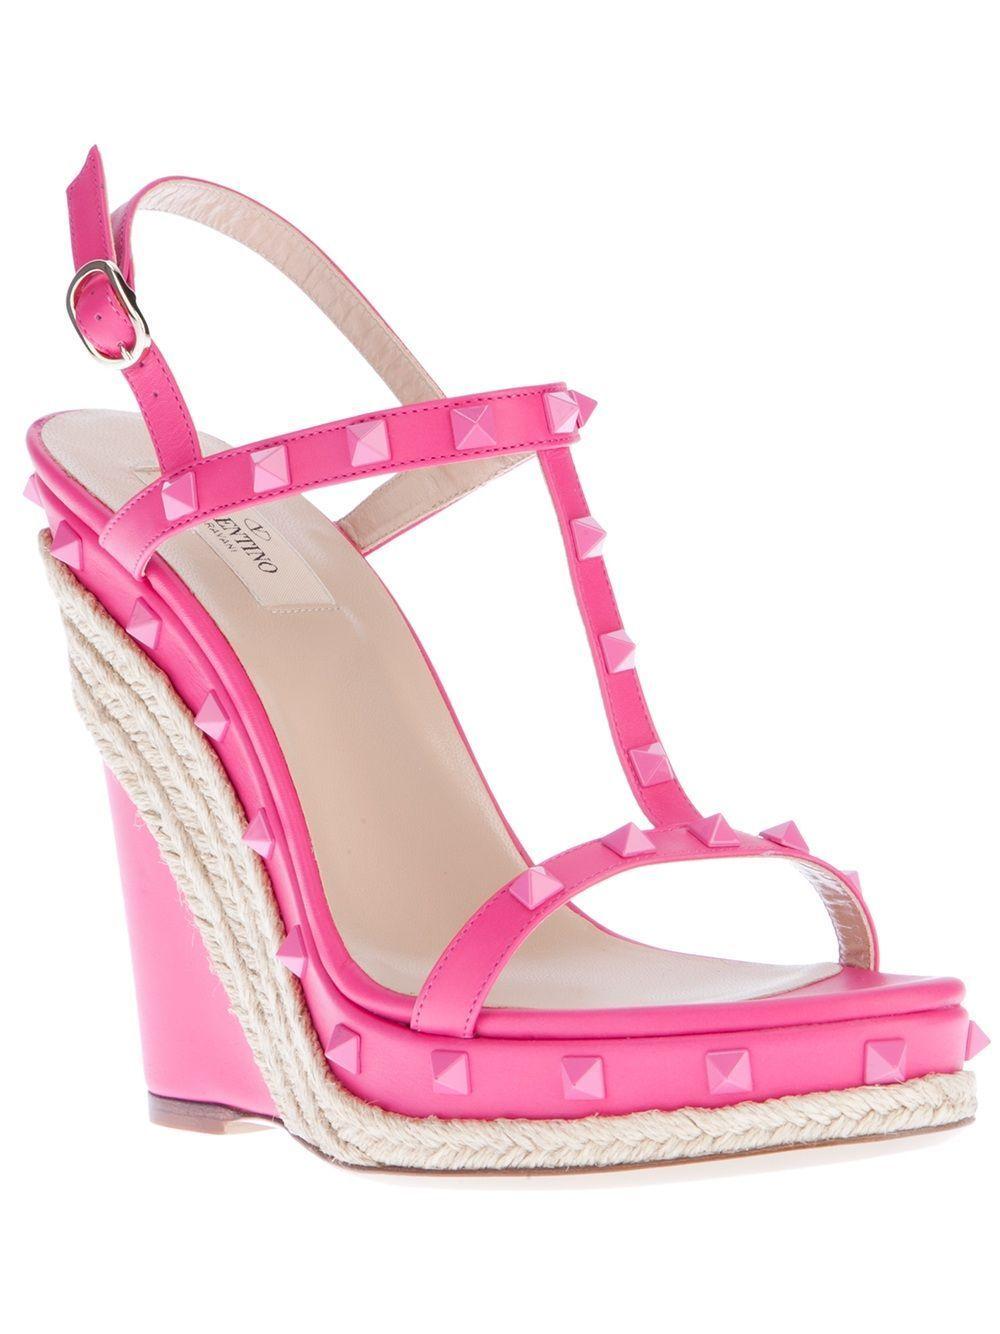 3aebe6f9ac42 Valentino Rockstud Wedge Sandal in Pink (pink   purple)